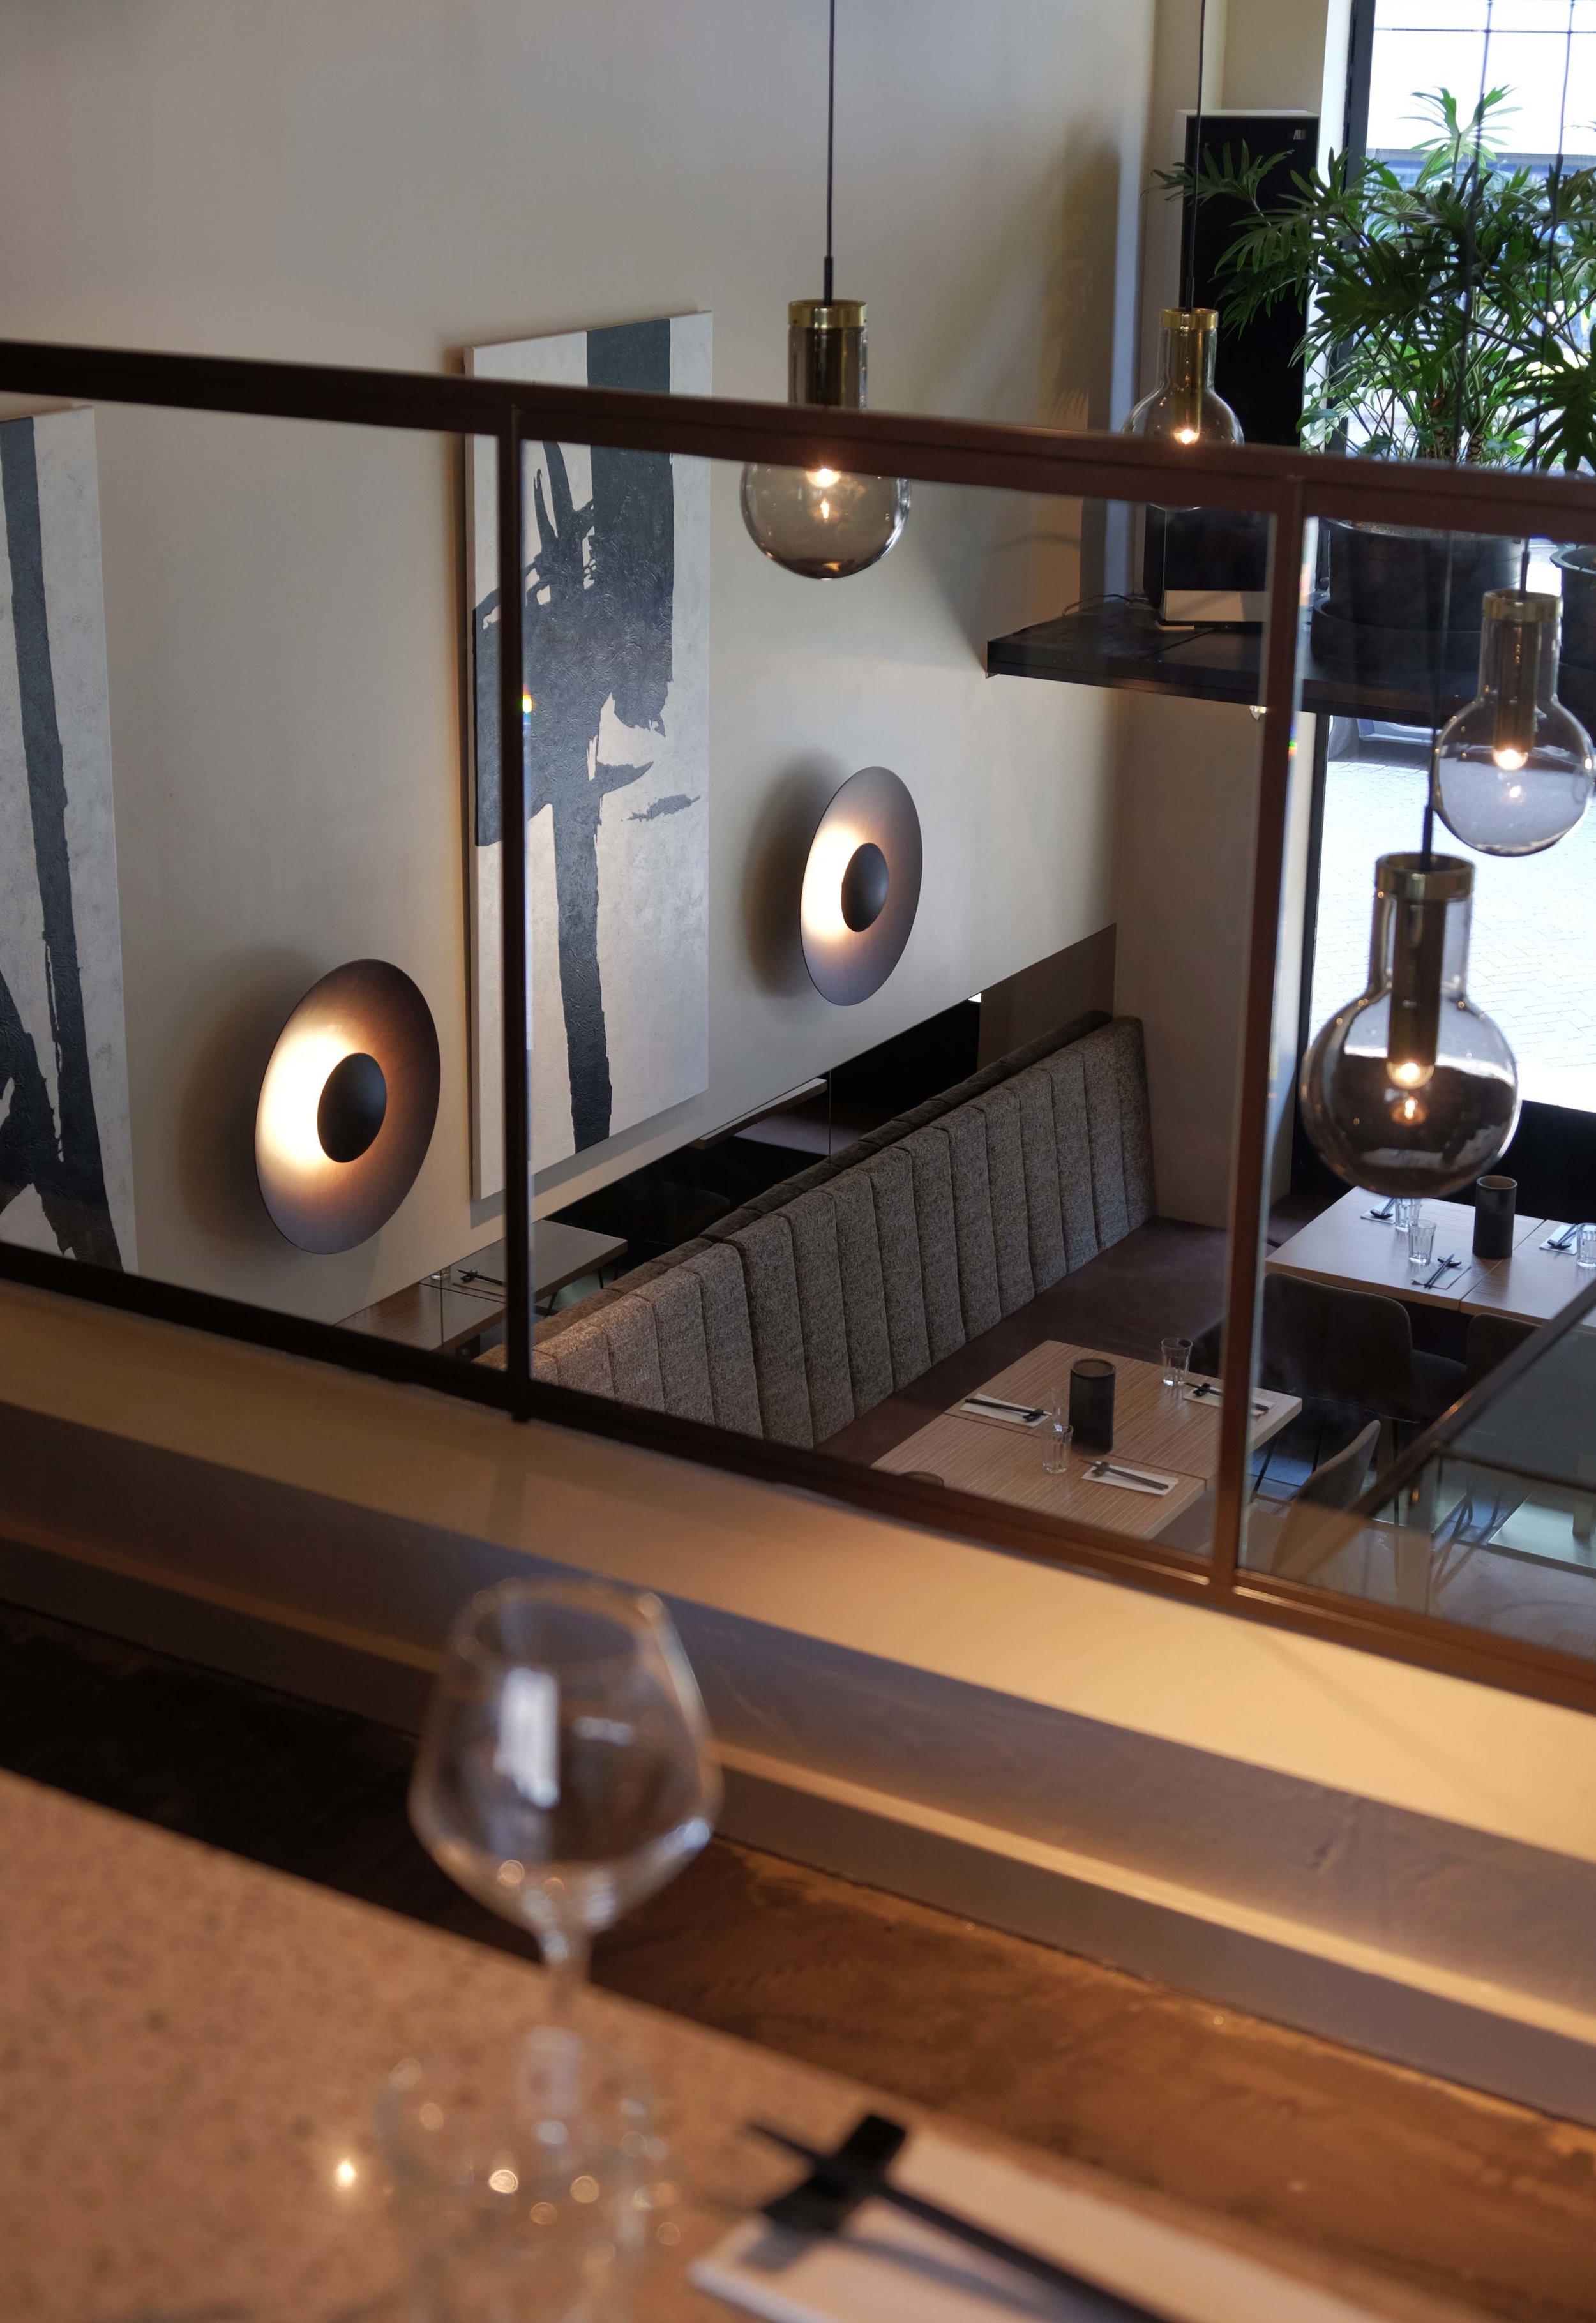 Restaurant Nooch Rotterdam westewagenstraat 56 lex de gooijer interiors 028.jpg